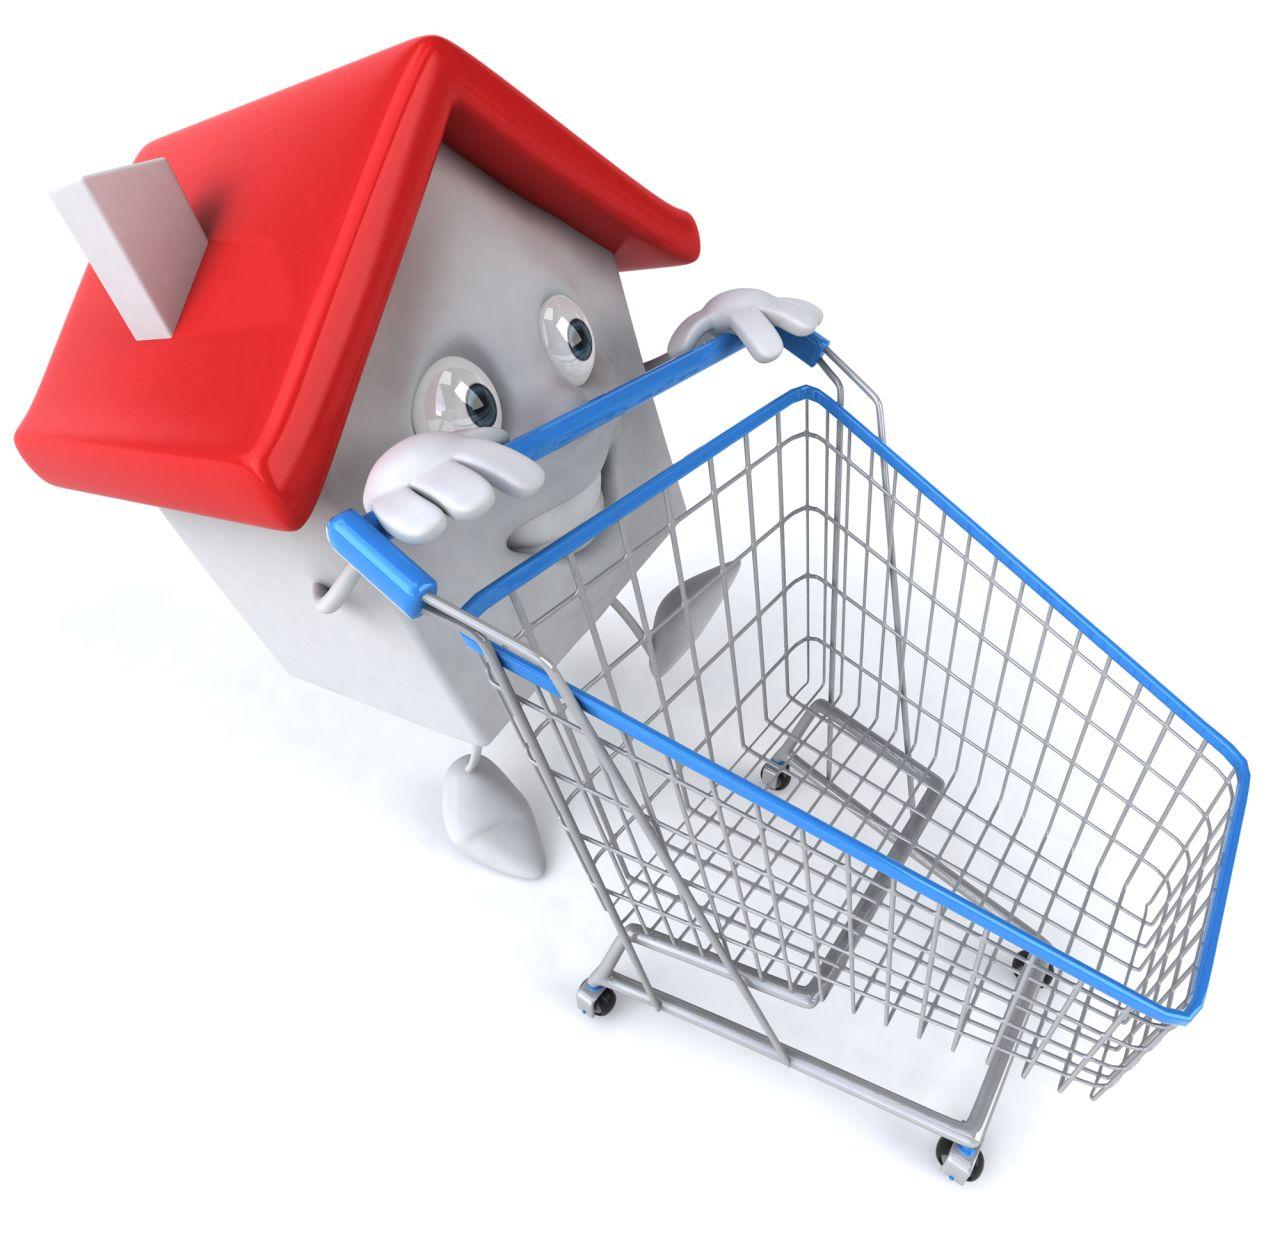 Atlanta condos for sale how do i select a broker House shopping